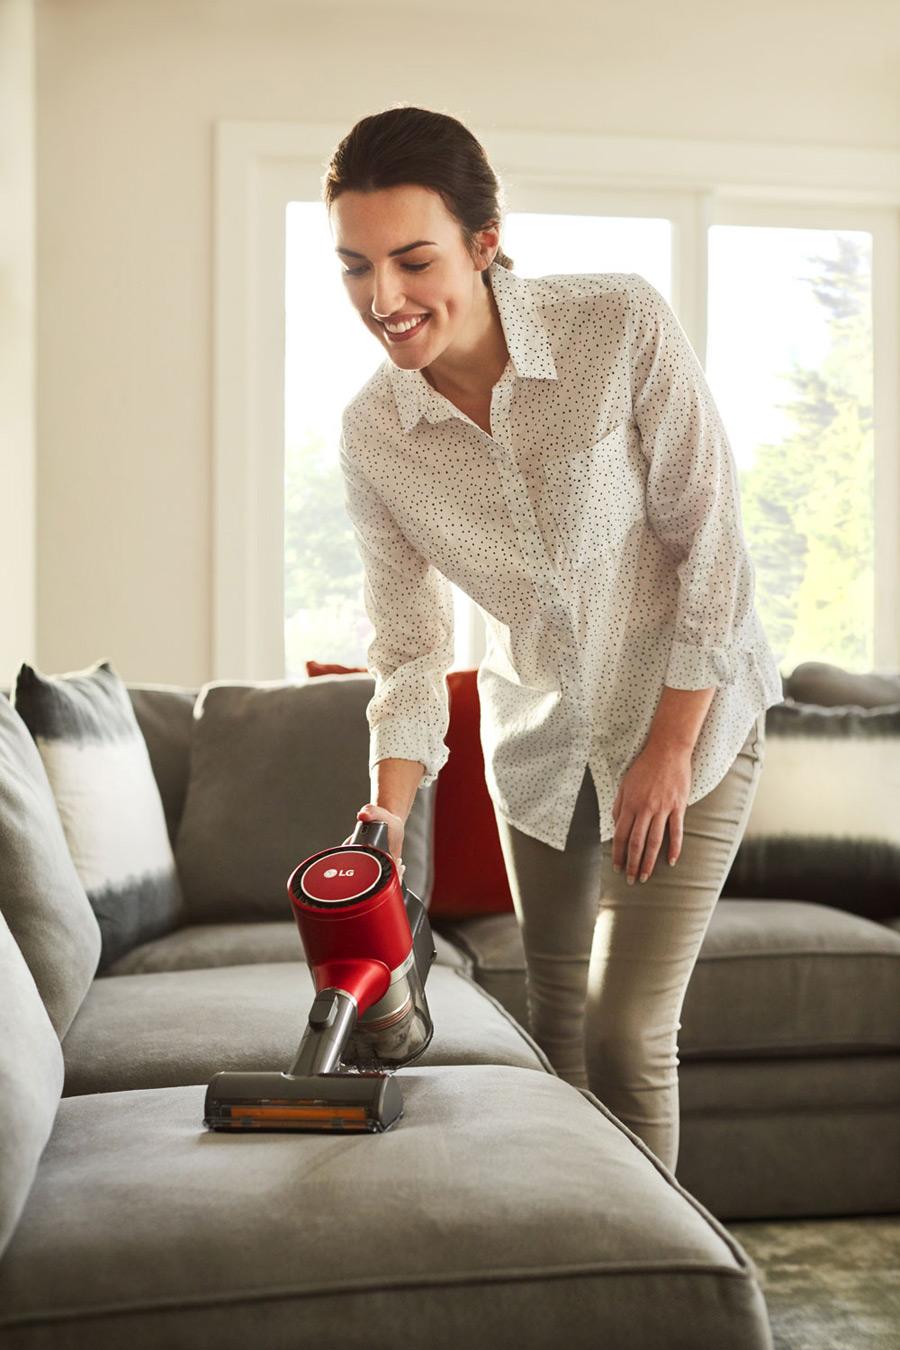 lg-handheld-vacuum-cleaner